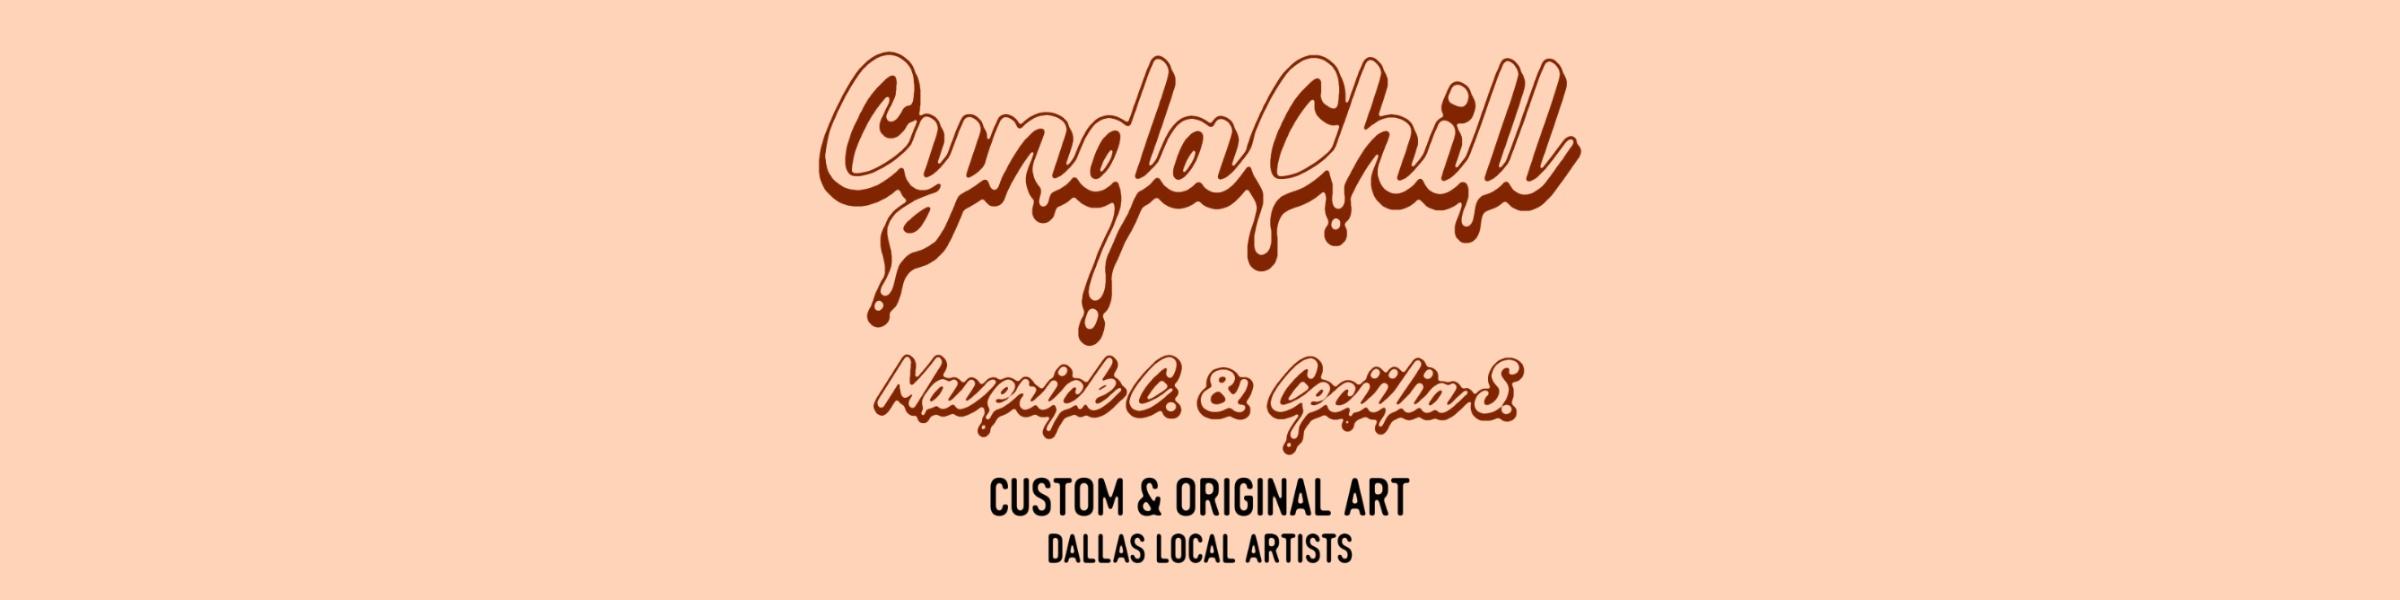 CyndaChill Cover